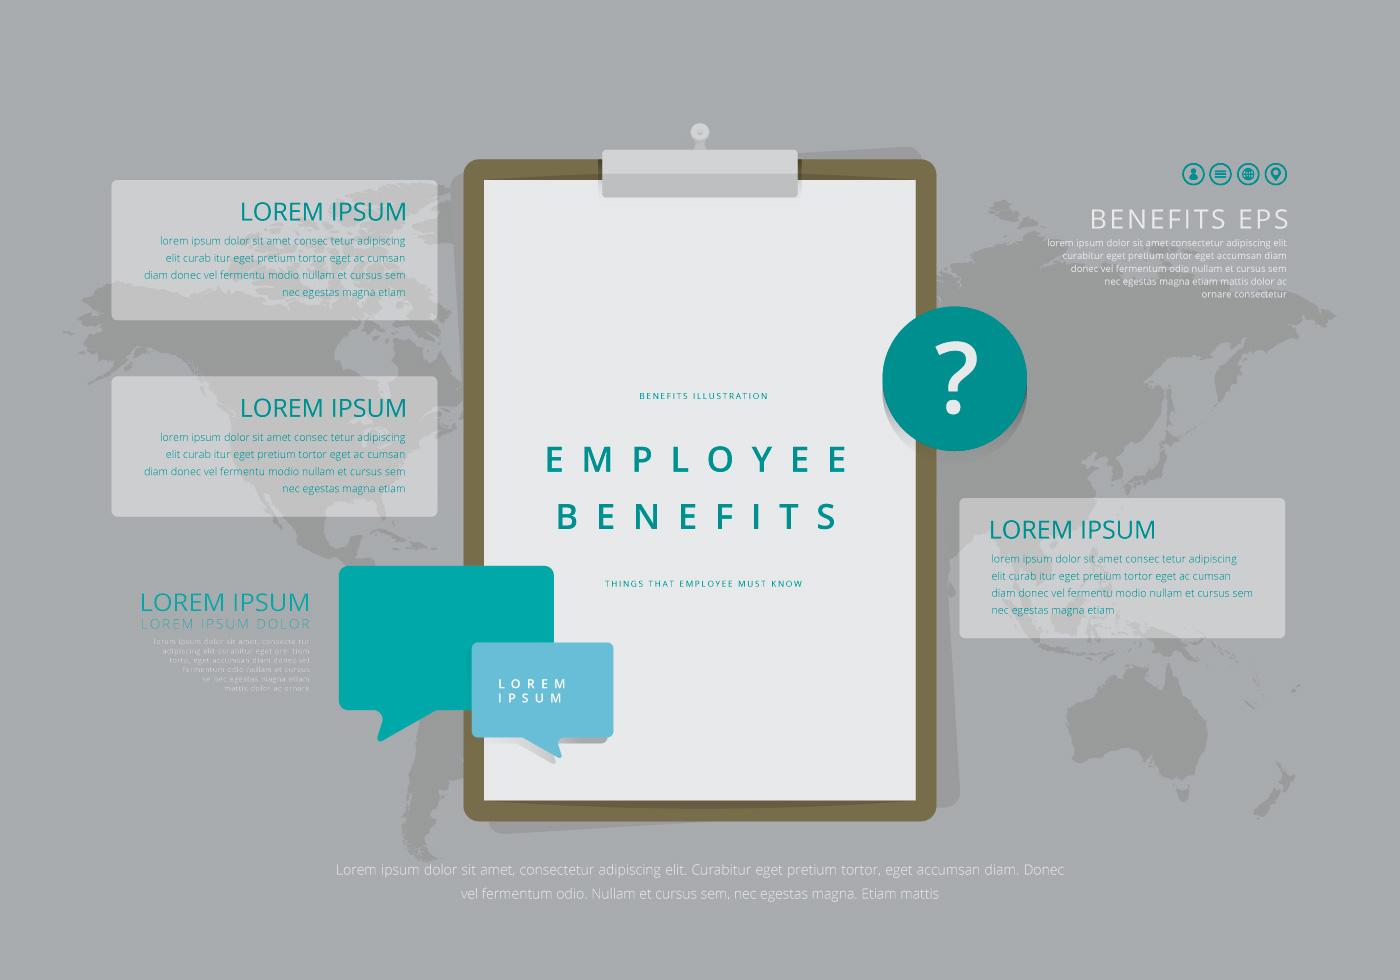 employee benefits infographic templates